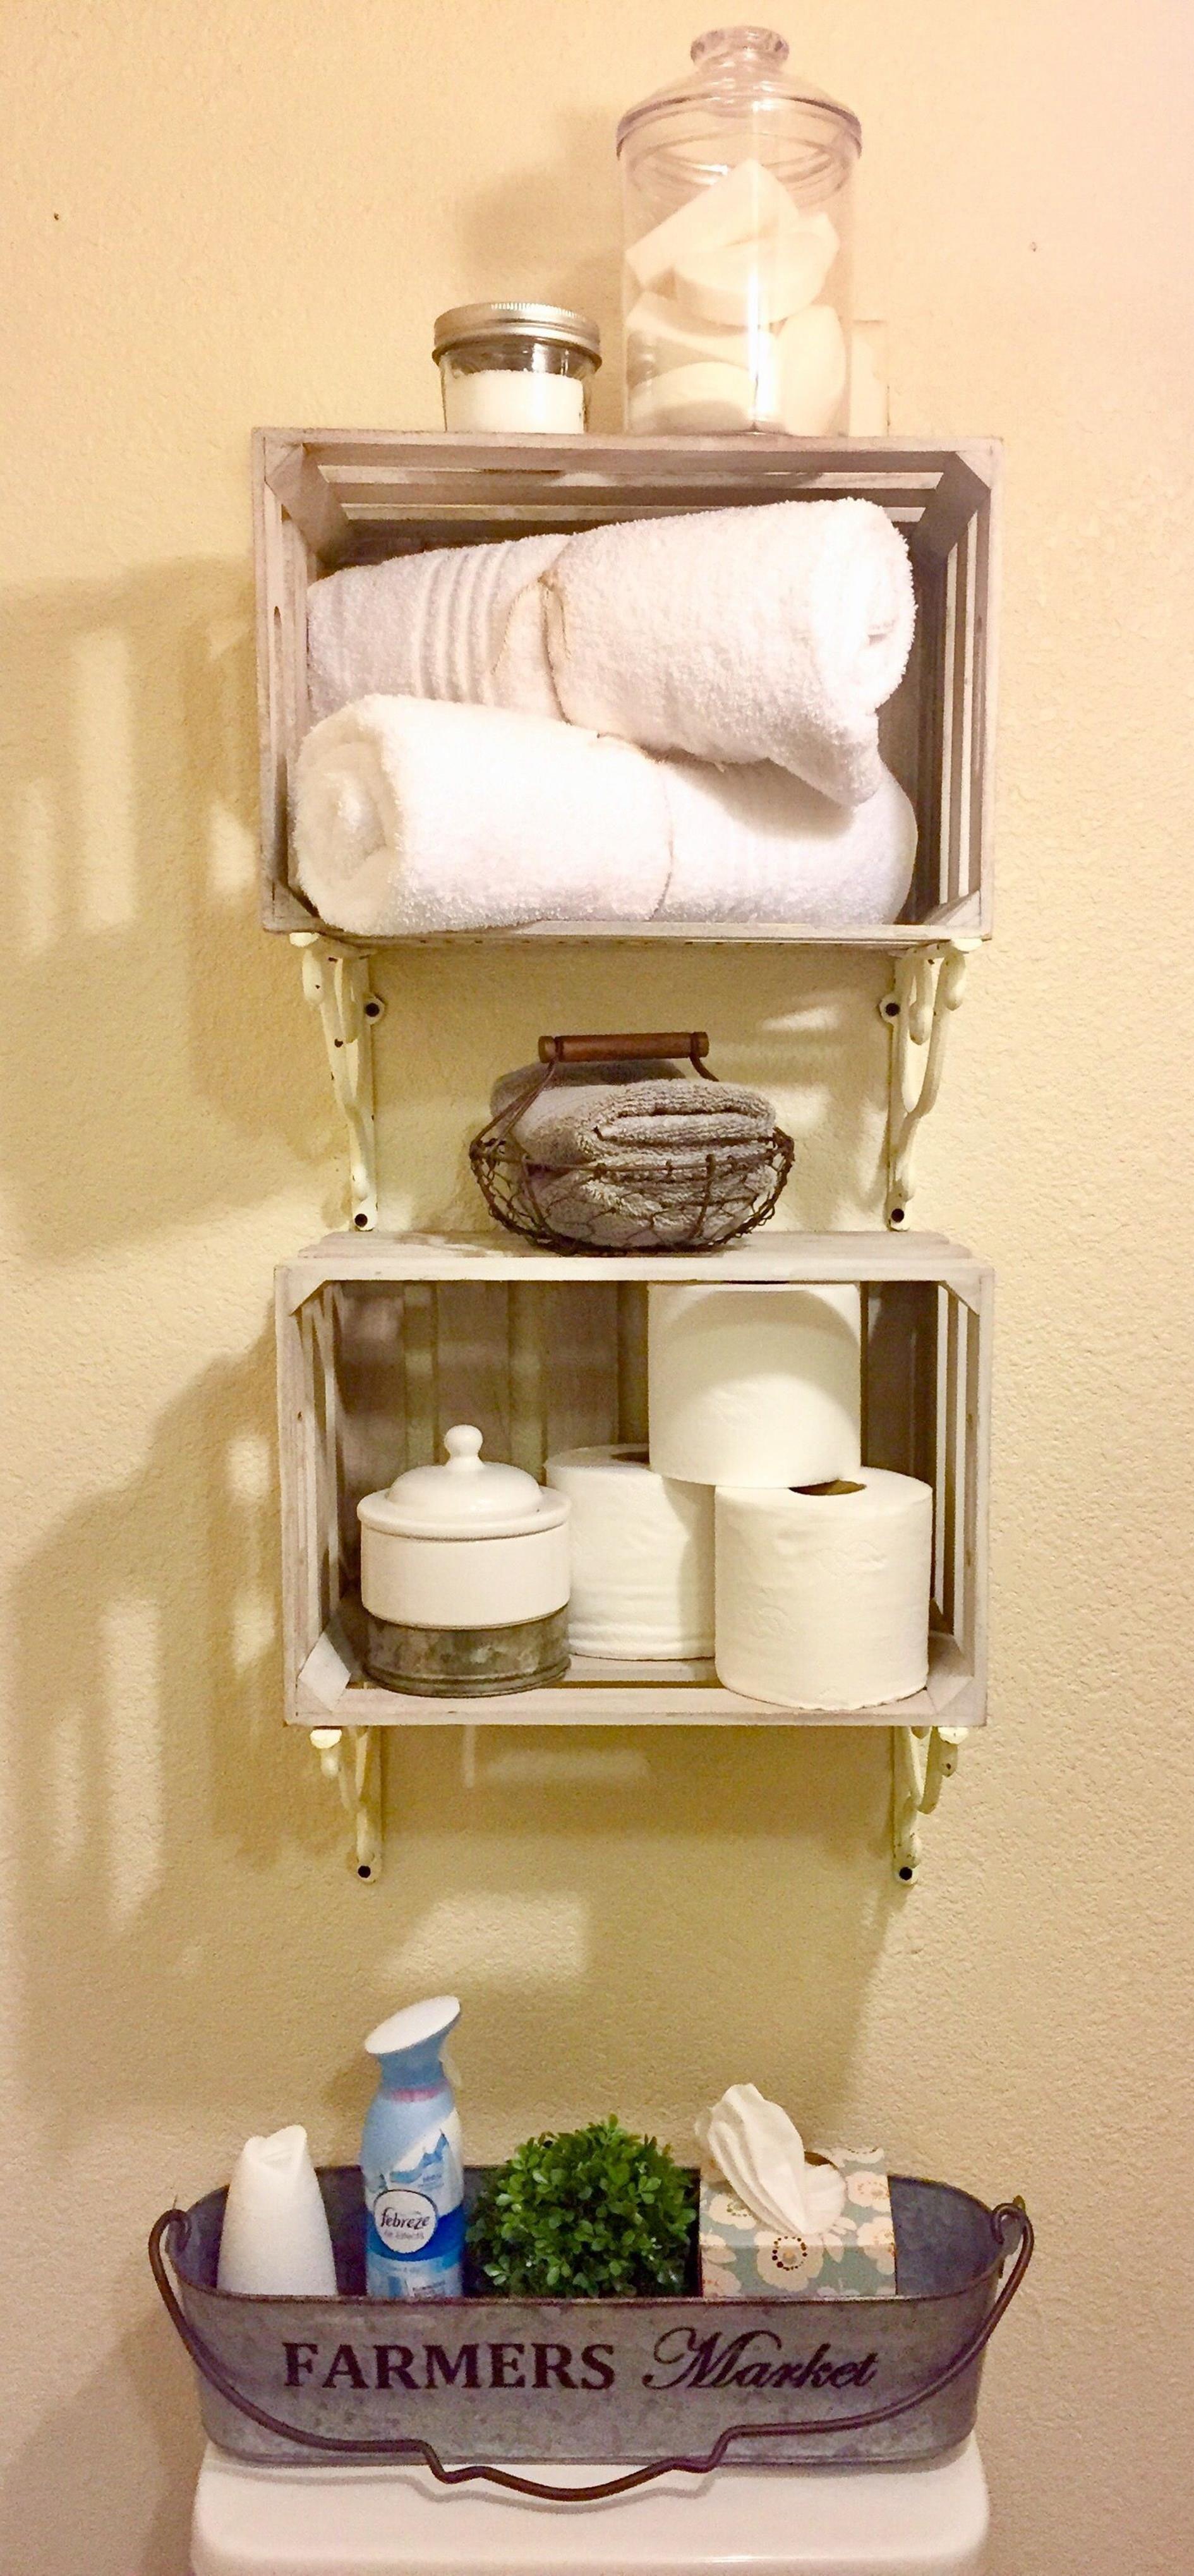 French Country Bathroom Decor Ideas 17